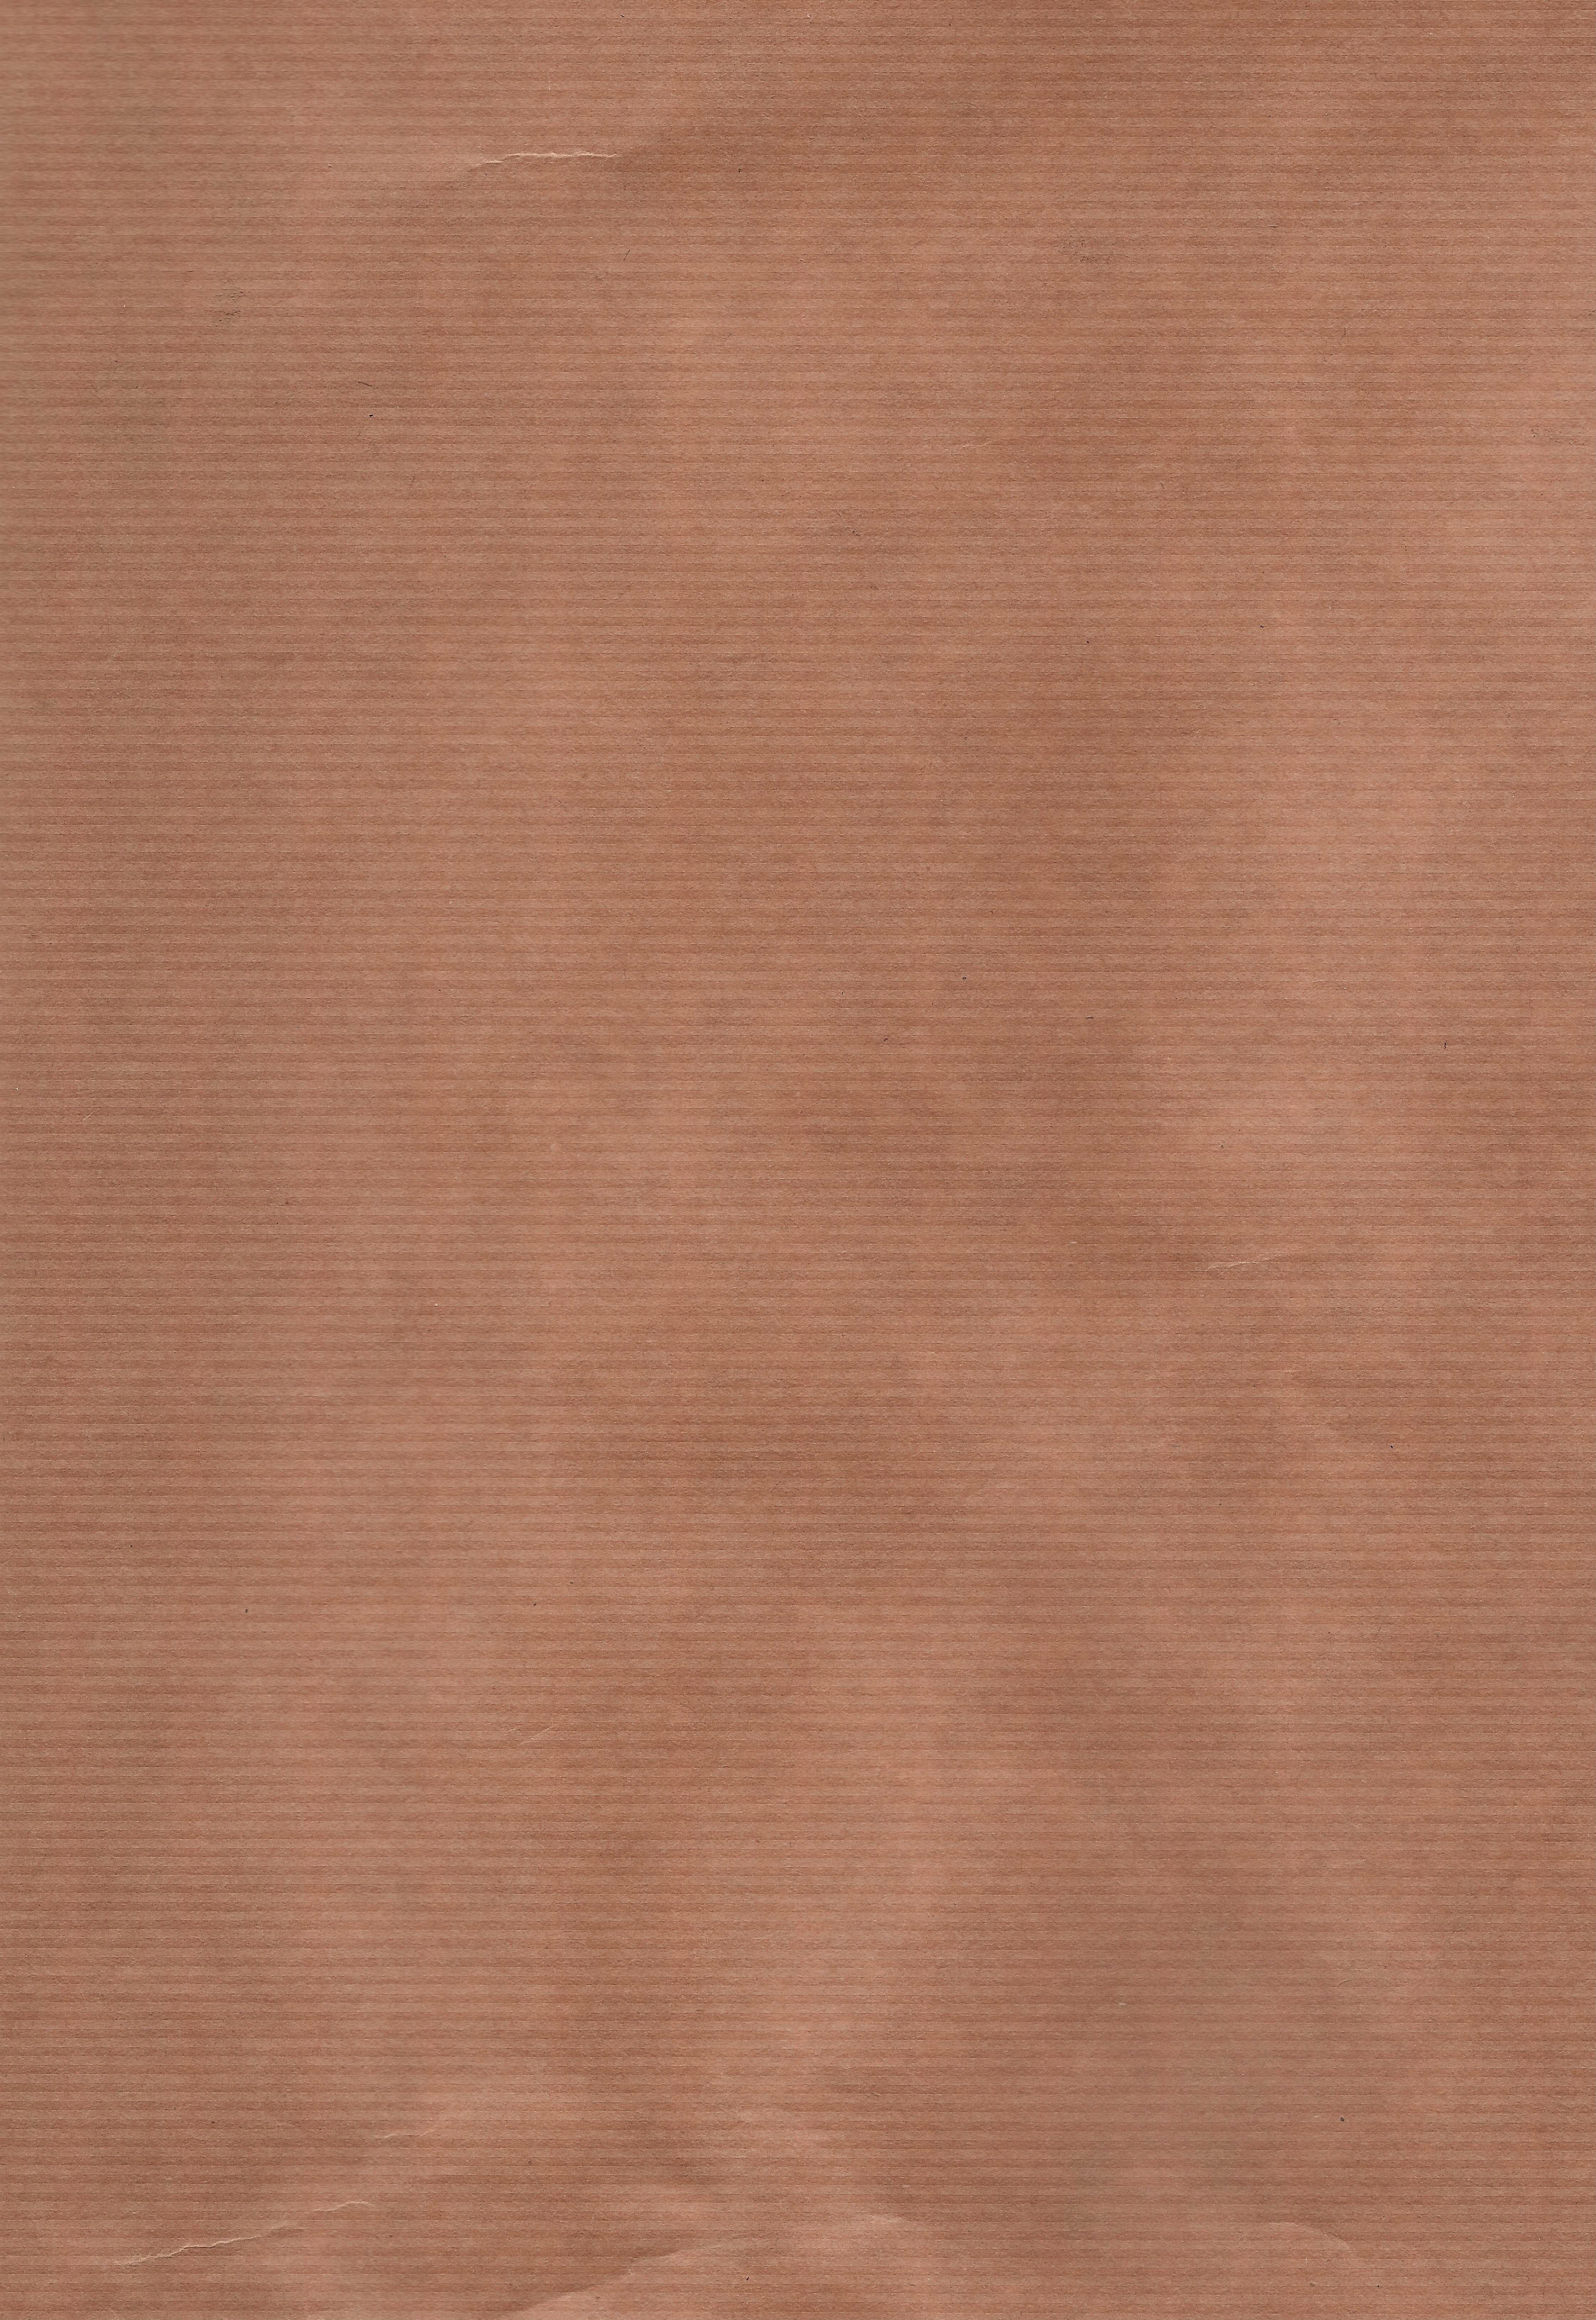 Free images texture floor pattern line brown tile paper wood texture floor pattern line brown tile paper material textile hardwood kraft flooring plywood wood flooring dailygadgetfo Choice Image